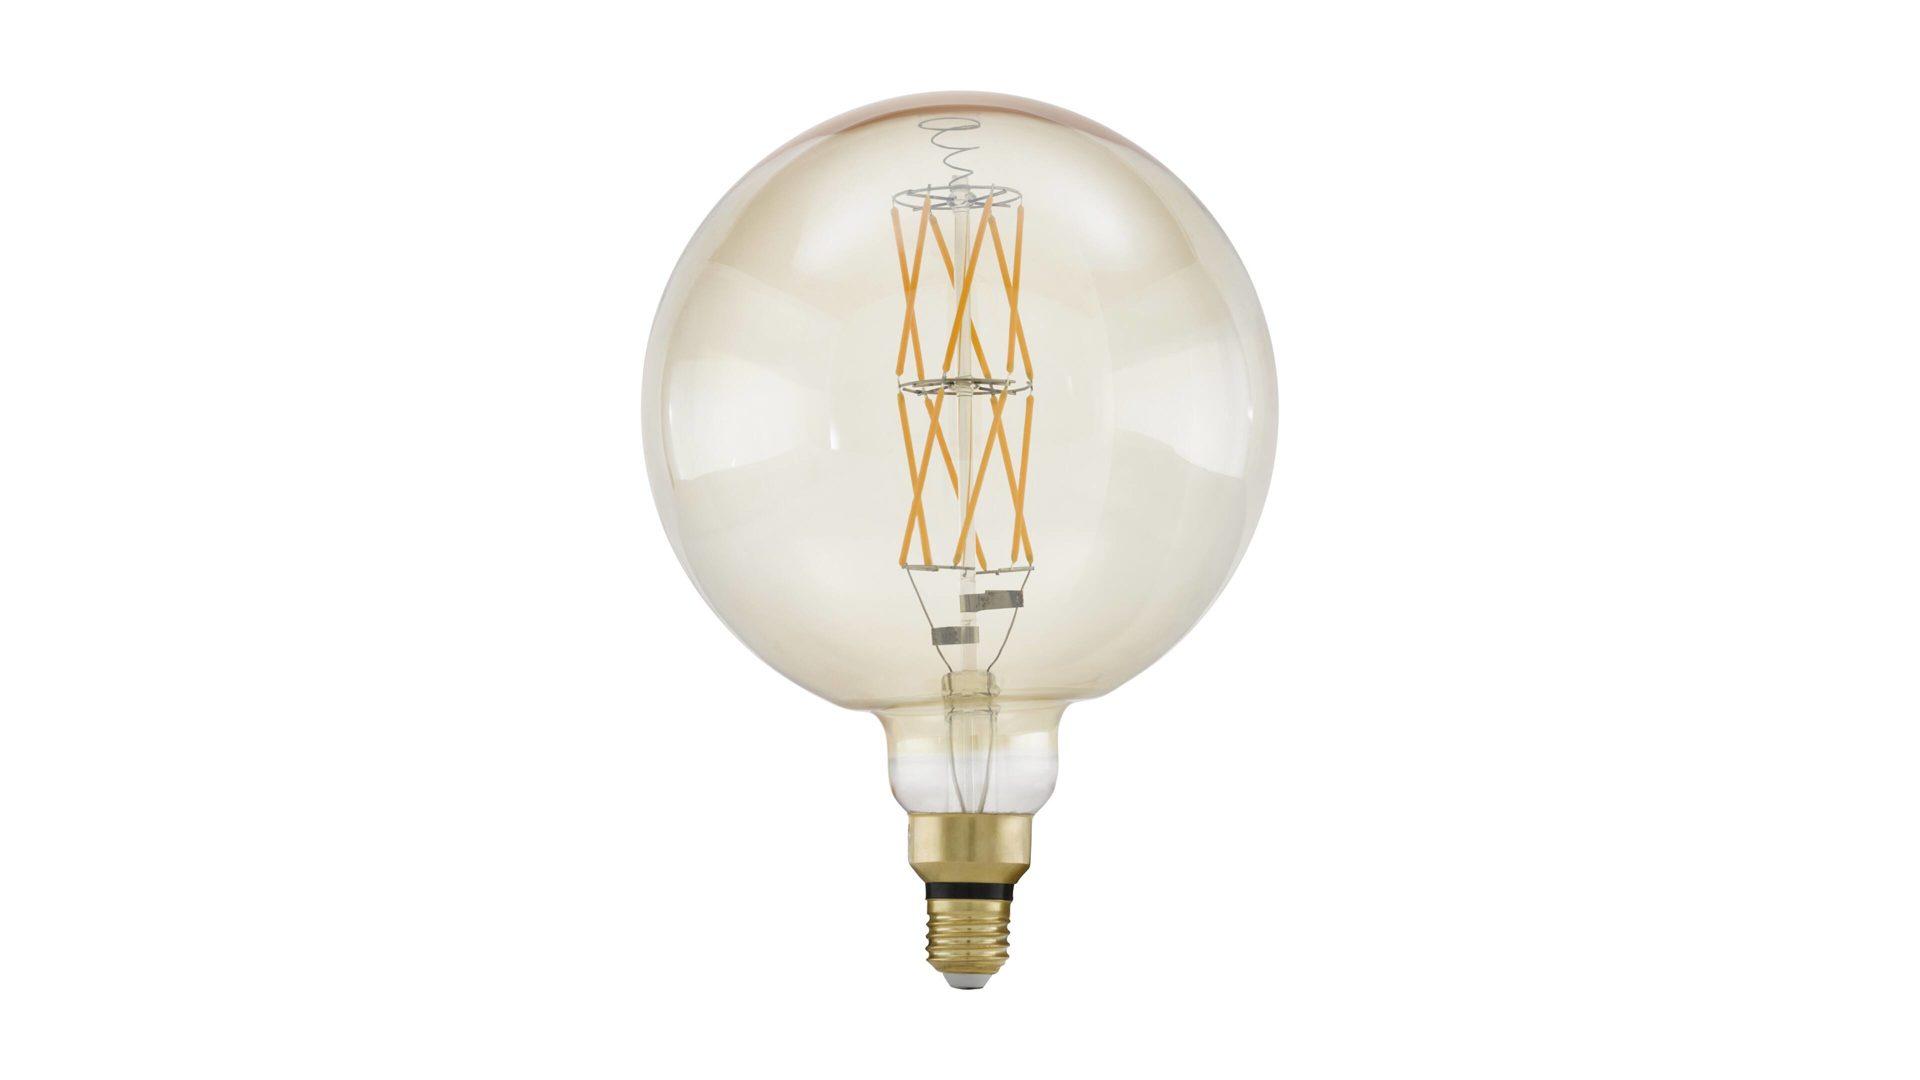 EGLO LED Leuchtmittel, warmweiß & amberfarbenes Glas – Durchmesser ca. 13 cm